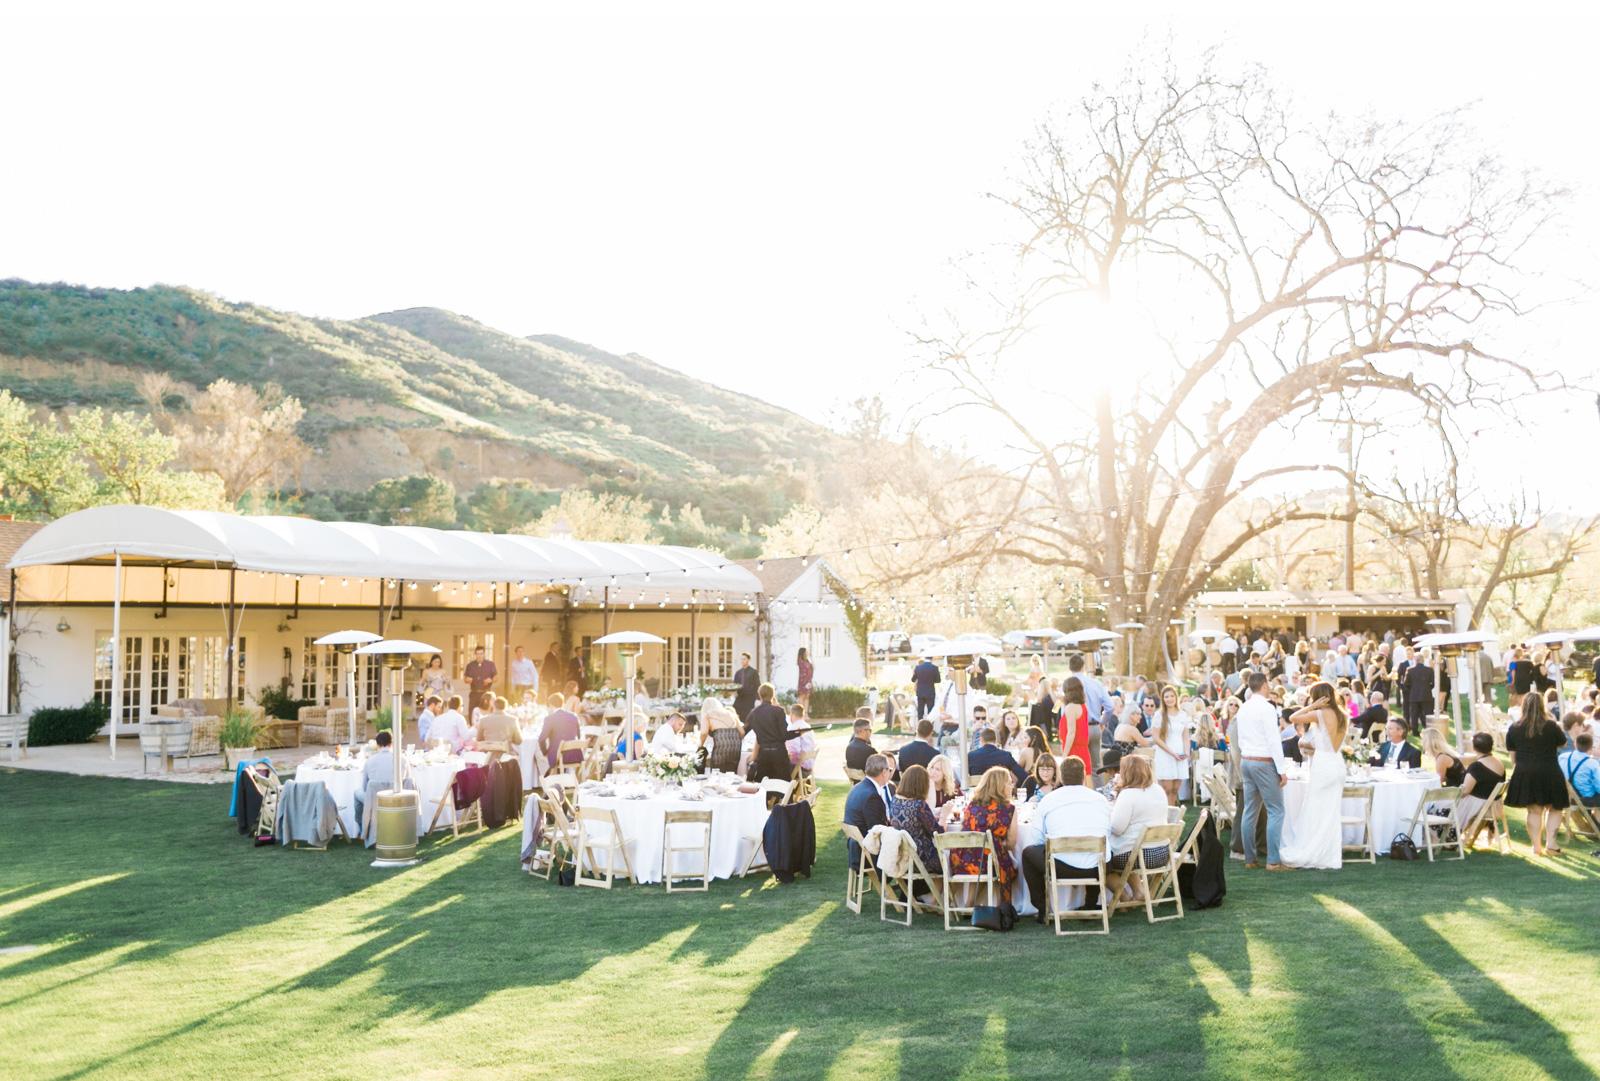 Triunfo-Creek-Malibu-Wedding-Natalie-Schutt-Photography-Couture-Events-Style-Me-Pretty_05.jpg